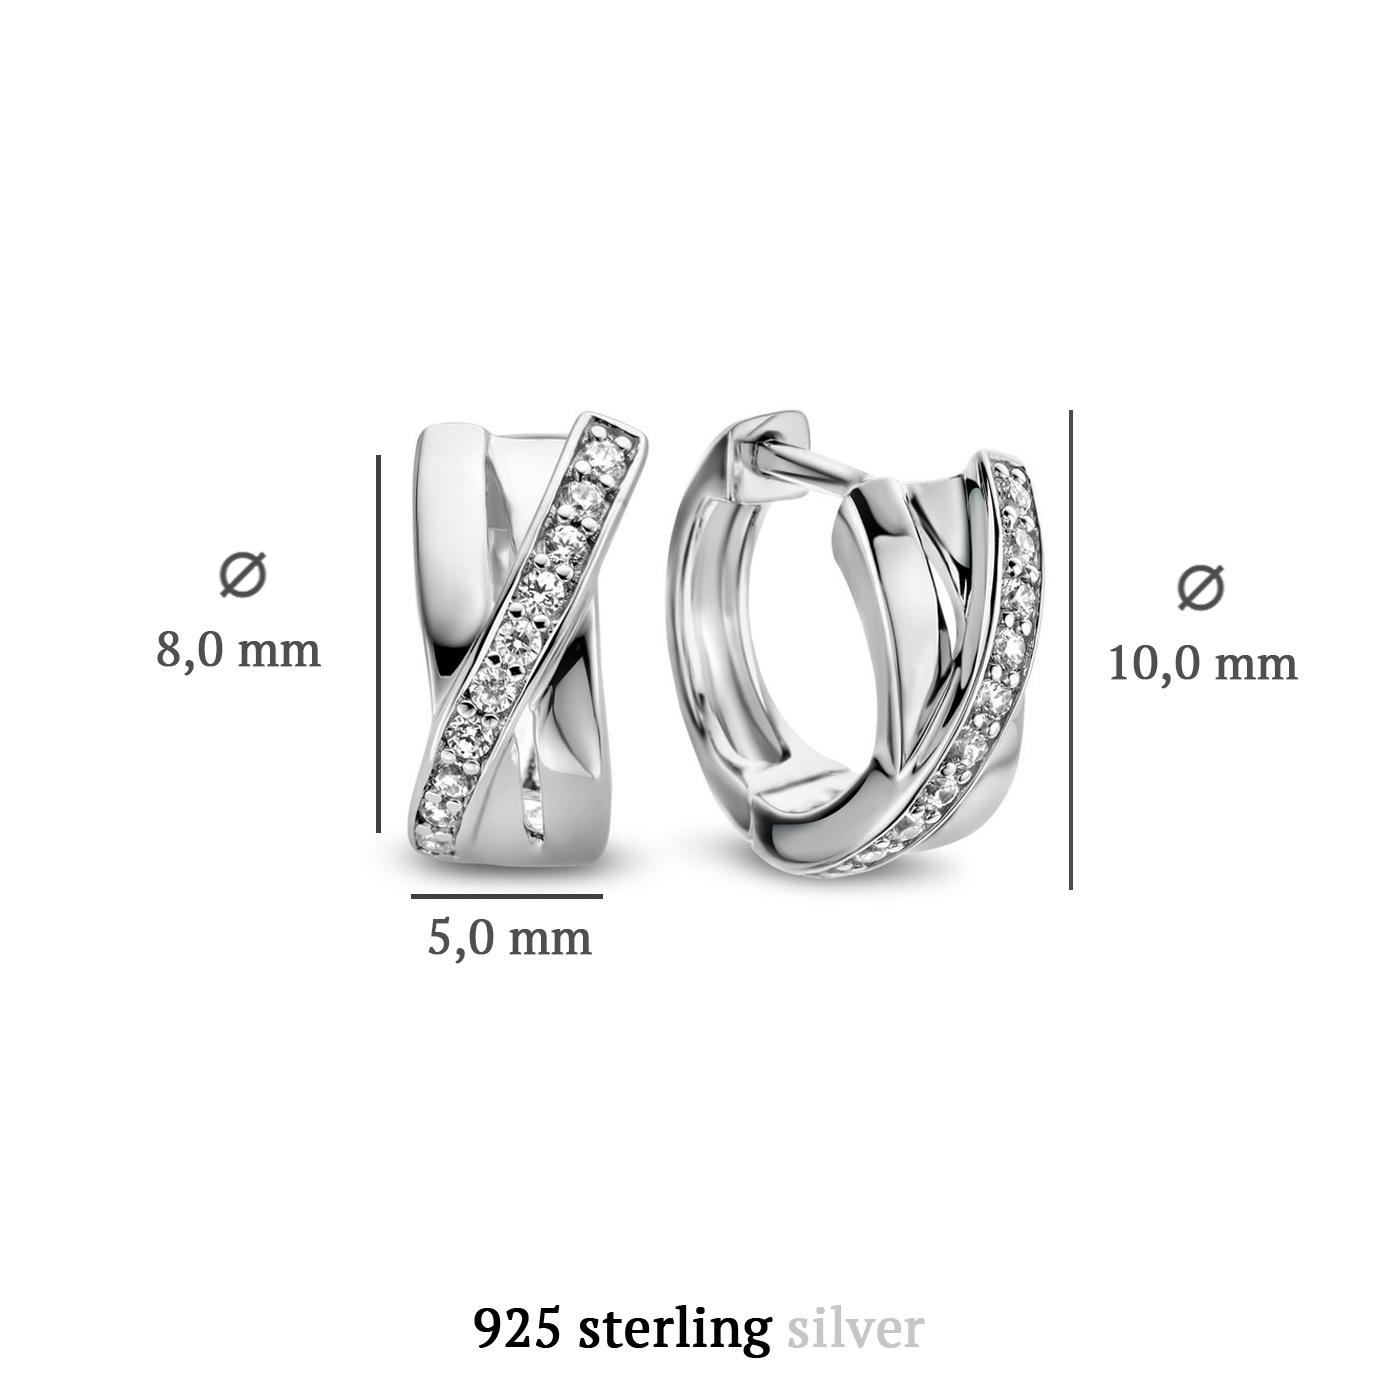 Parte di Me Ponte Vecchio Vasariano creole in argento sterling 925